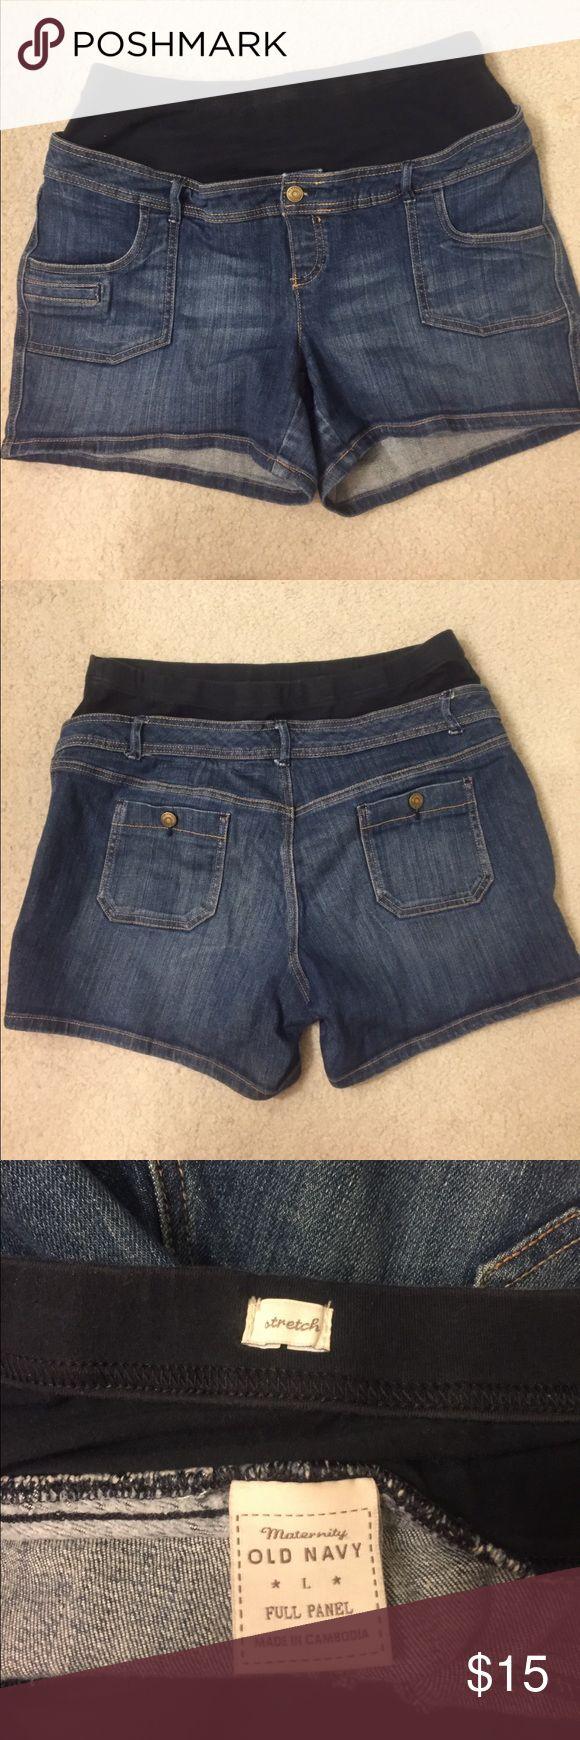 Old Navy maternity shorts Dark denim Old Navy maternity shorts. Size L. EUC. Very comfortable and soft. Old Navy Shorts Jean Shorts